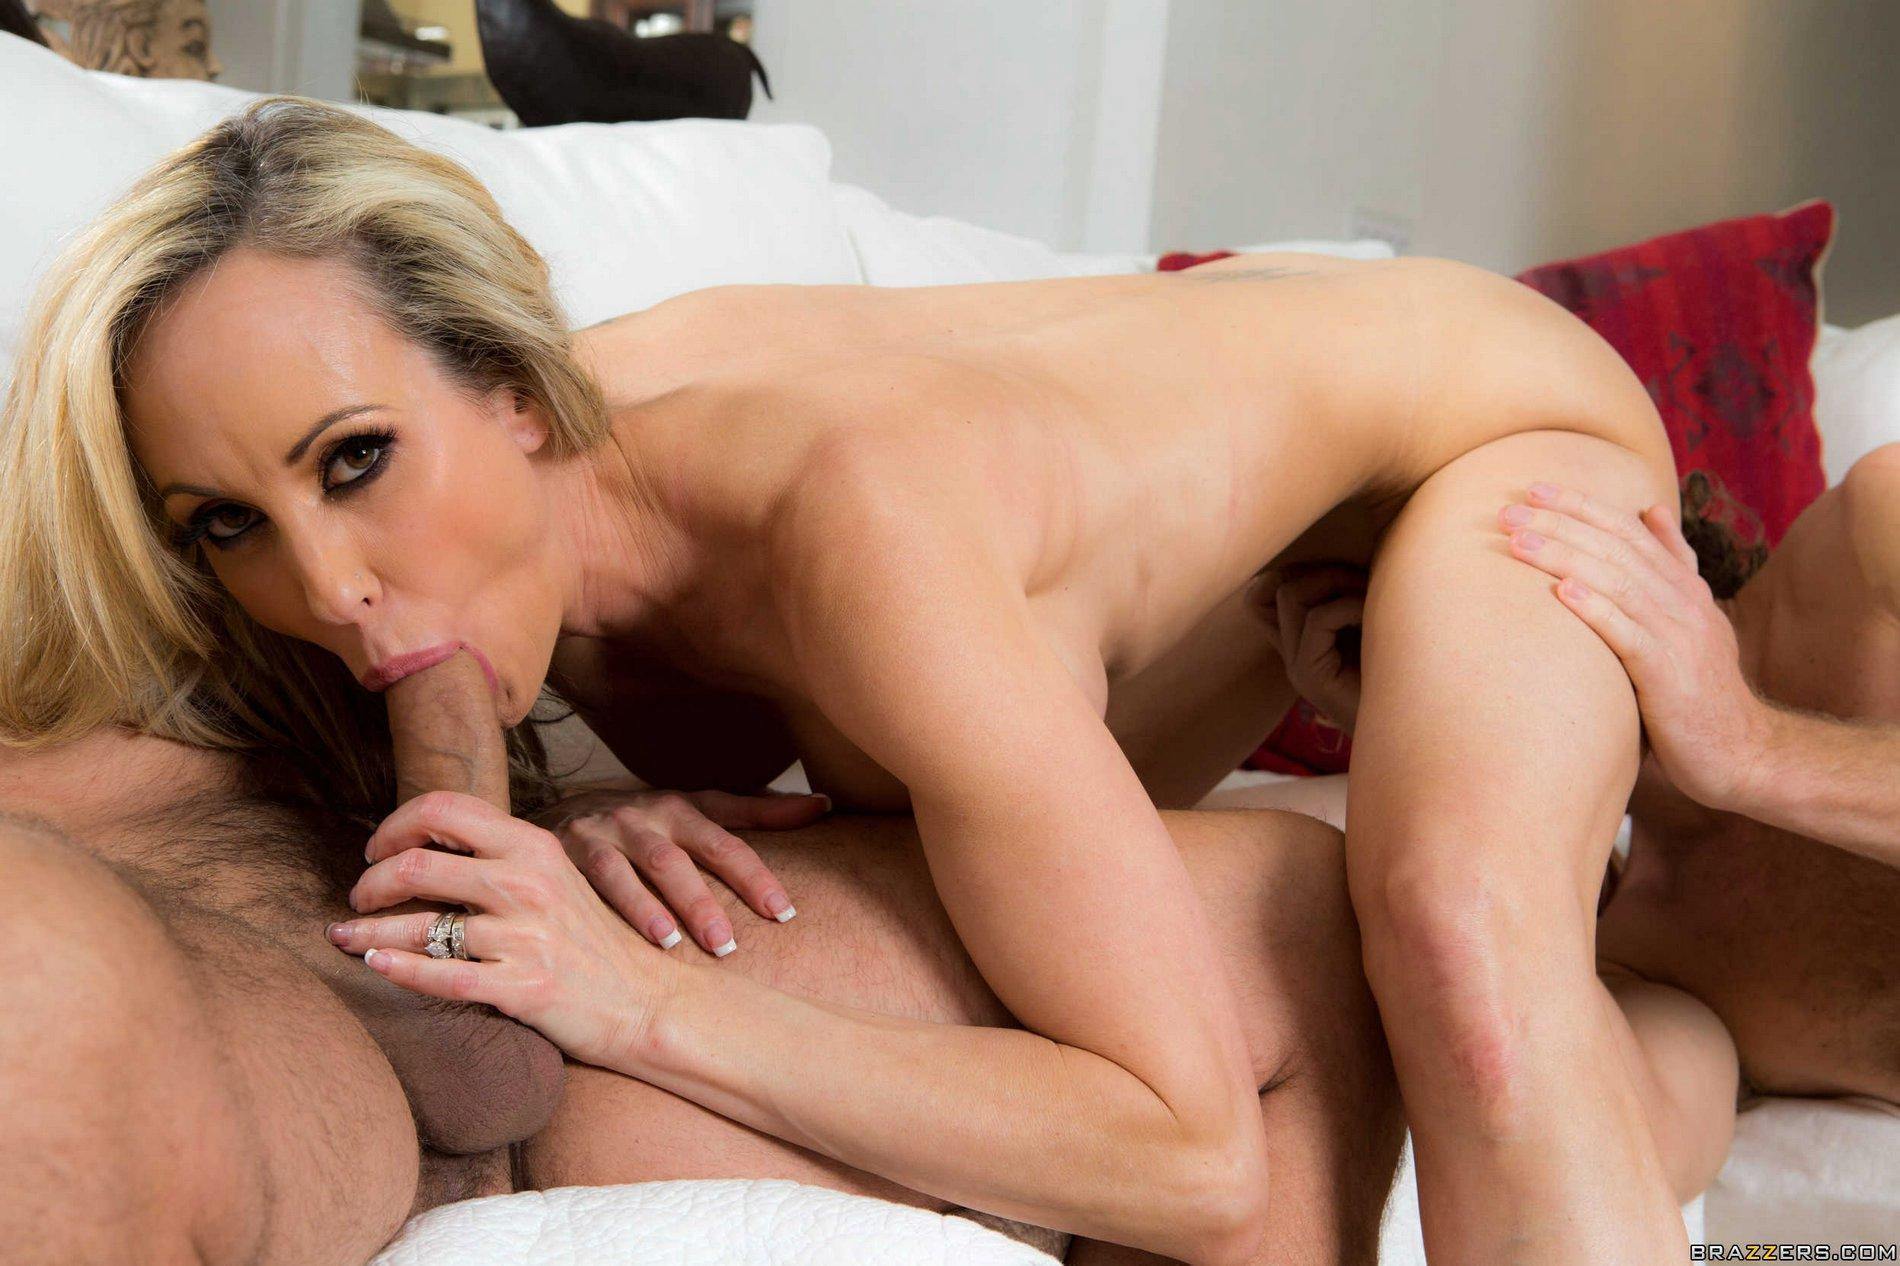 Incredibly Sexy Blonde Milf In Black Stuff Brandi Love Works On Stiff Dick